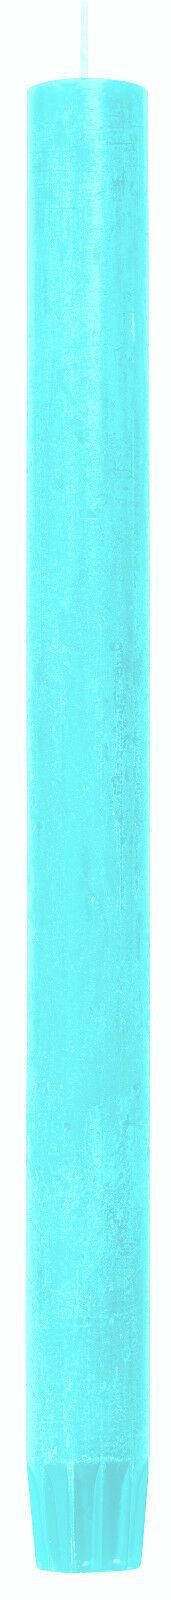 24 Stabkerzen Tafelkerzen Rustic Kerzen Groß 270 x 23 mm durchgefärbt 0,65€/Stk. - Mint 69